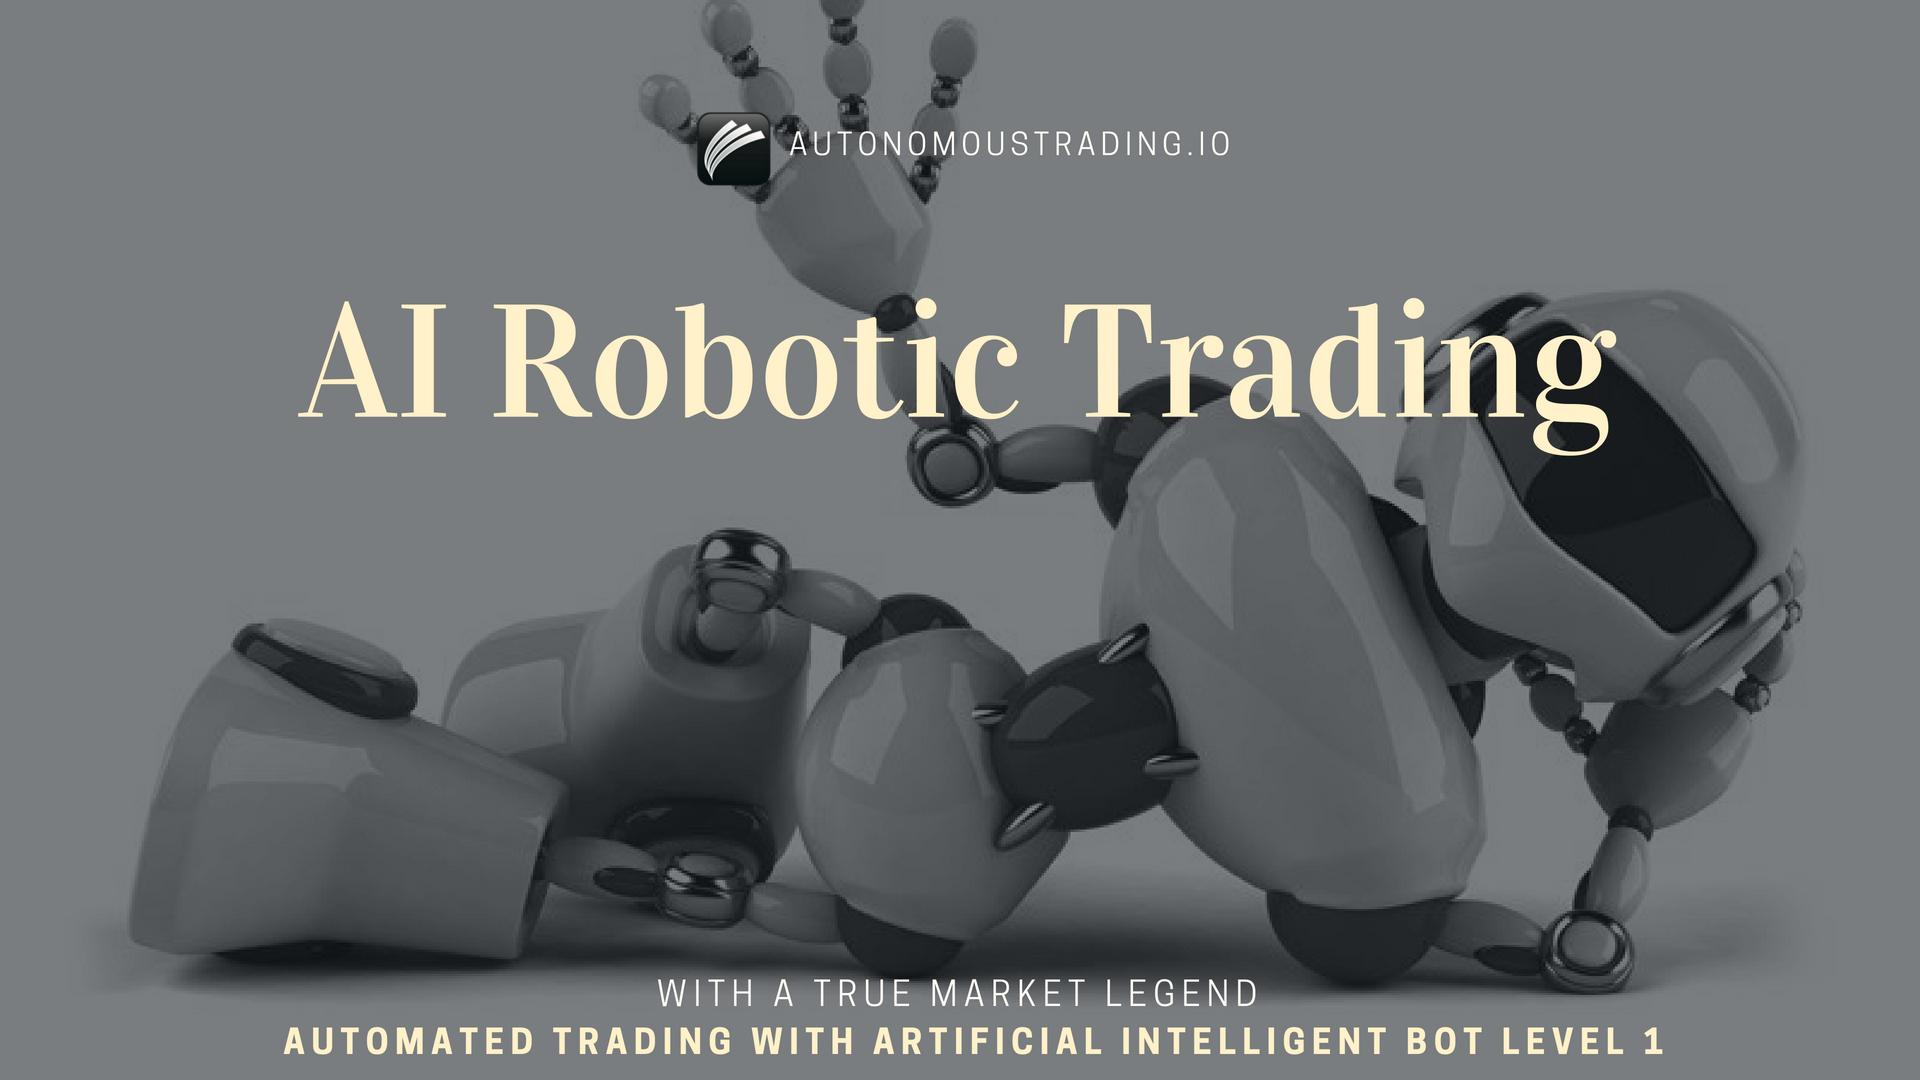 robotic autonomous trading apple stock analysis